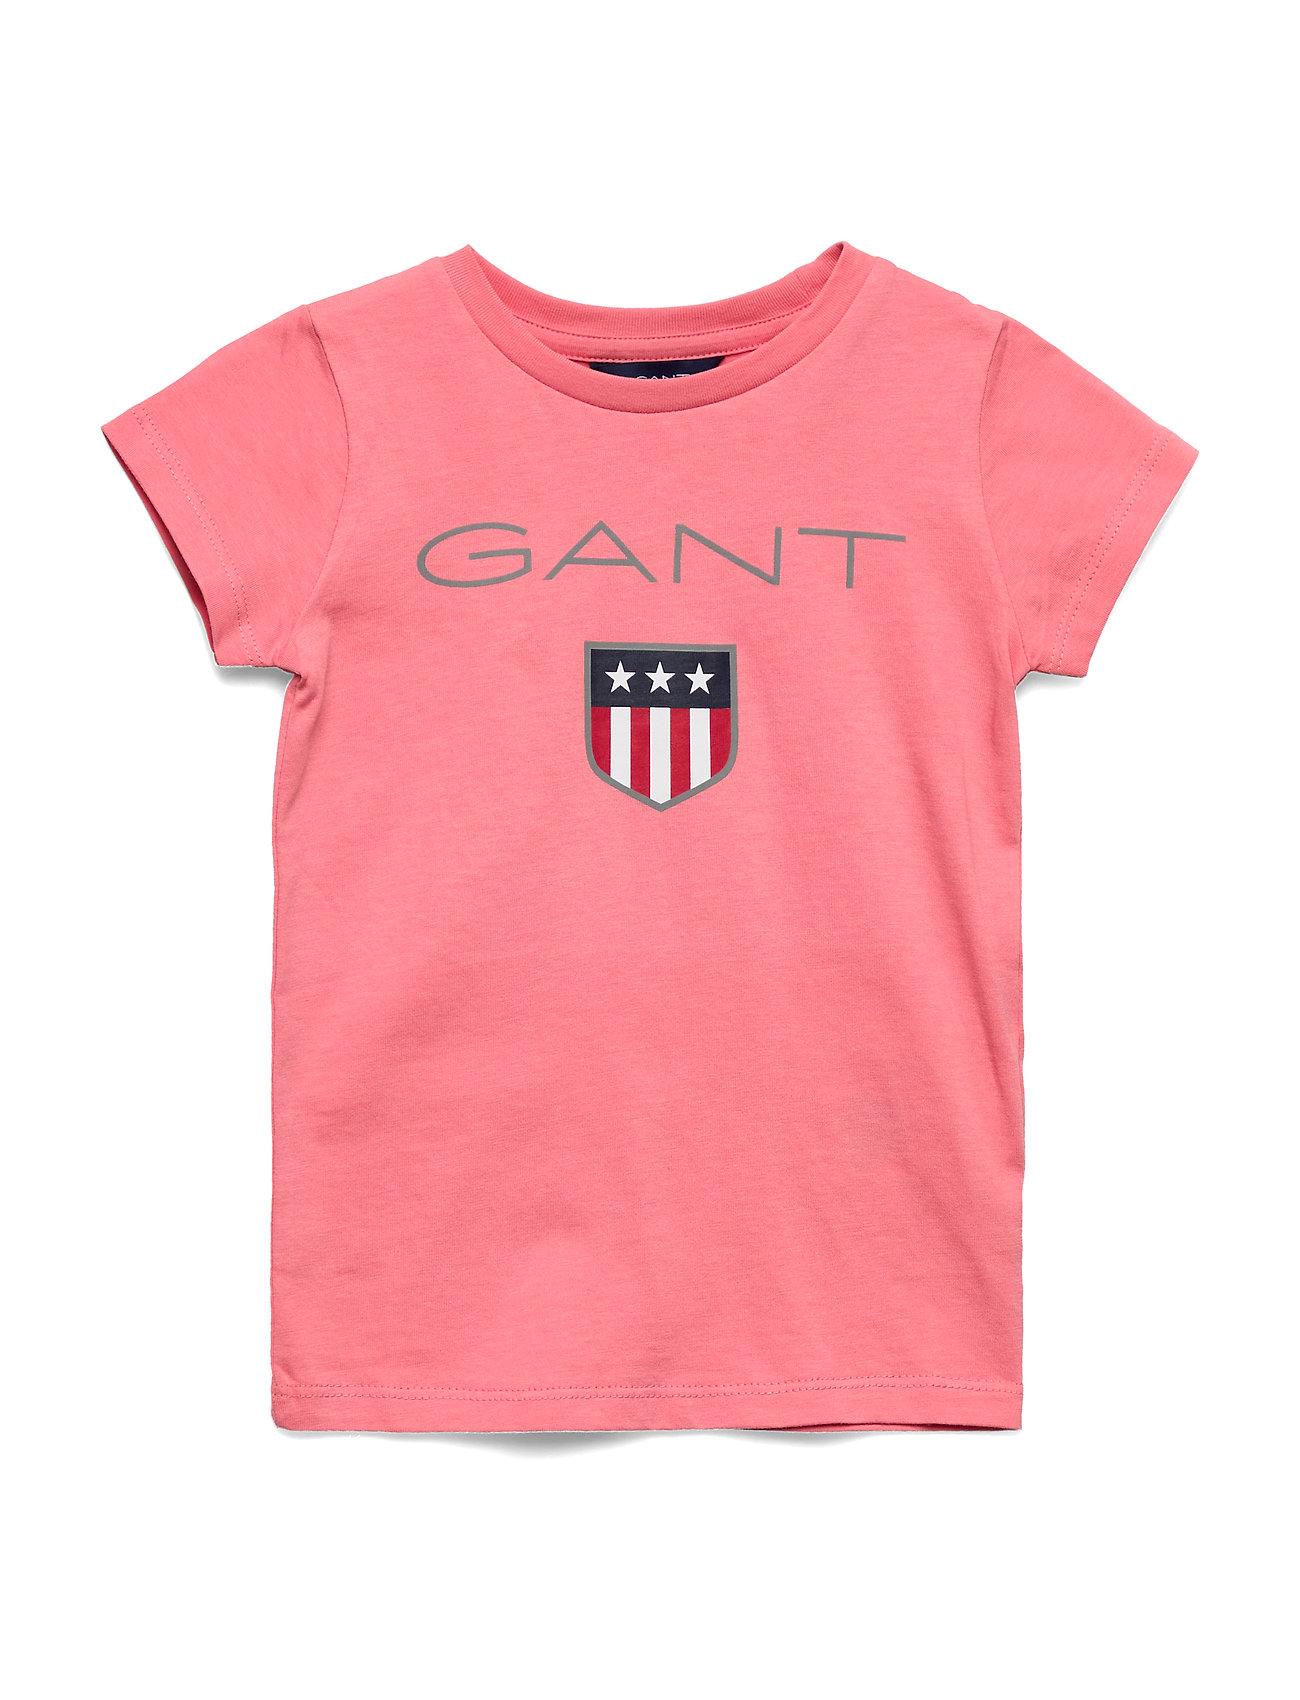 Gant GANT SHIELD LOGO SS T-SHIRT - STRAWBERRY PINK